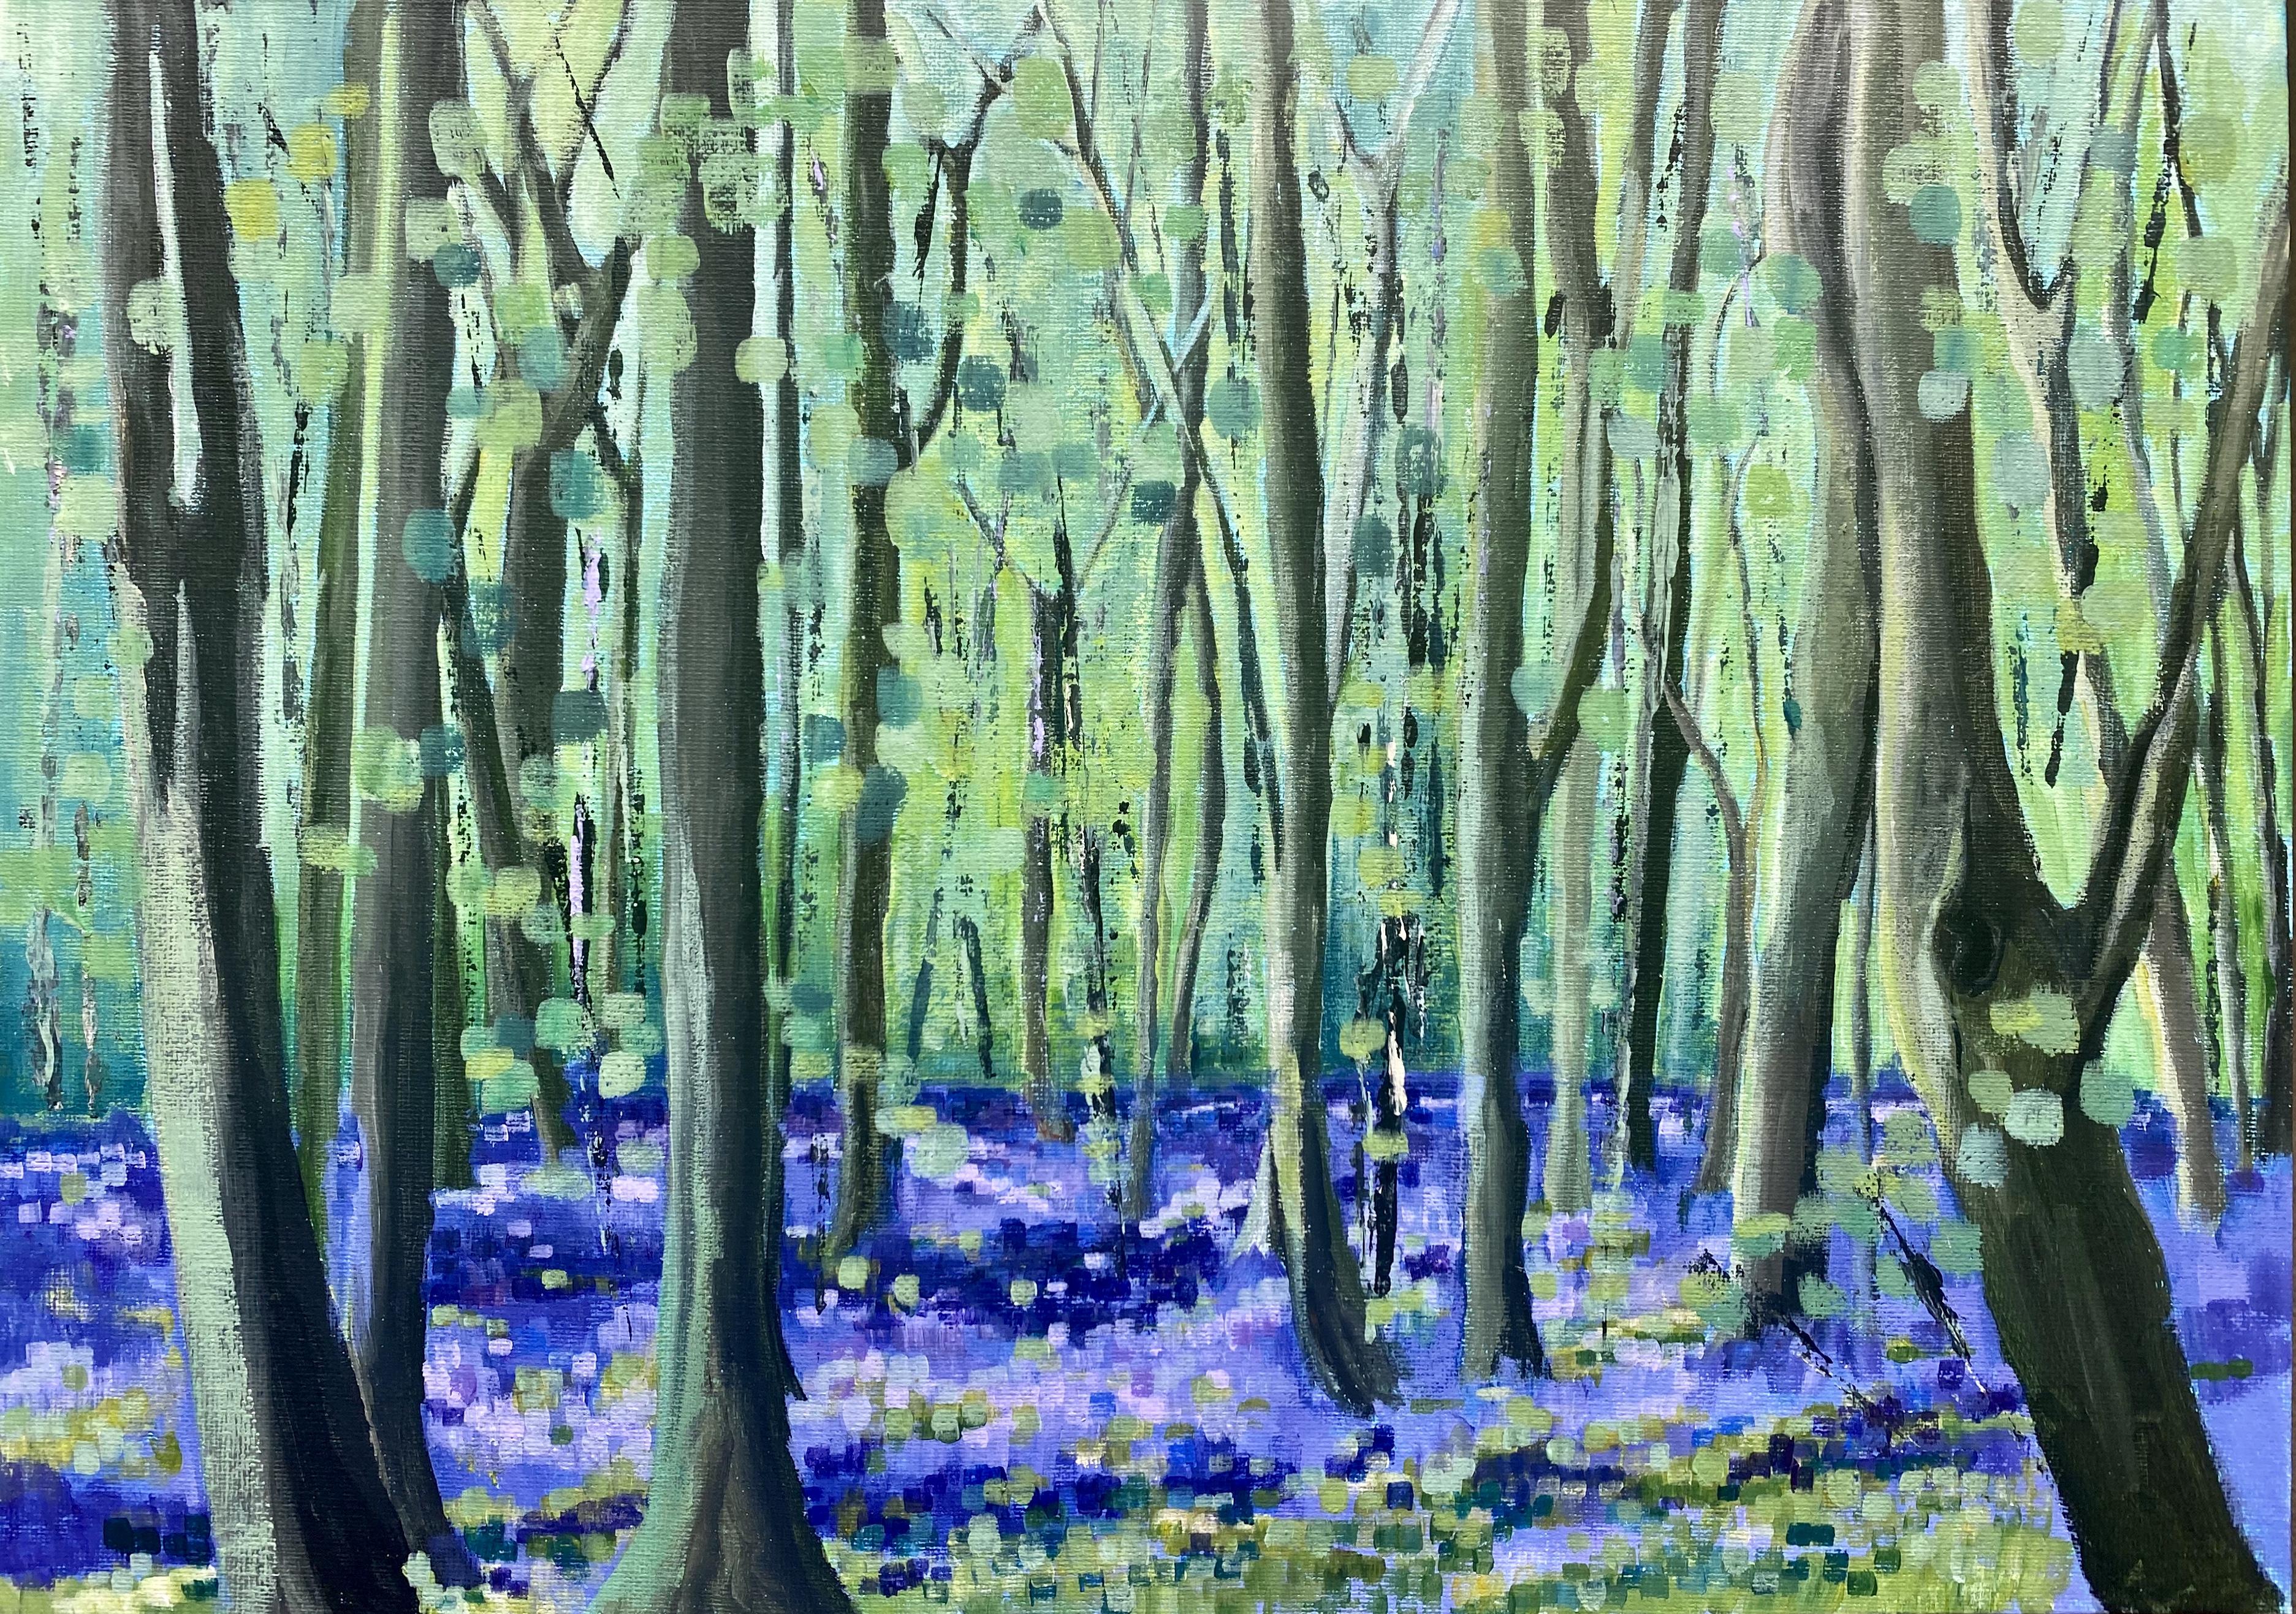 Bluebell Woods by Deborah Copeland